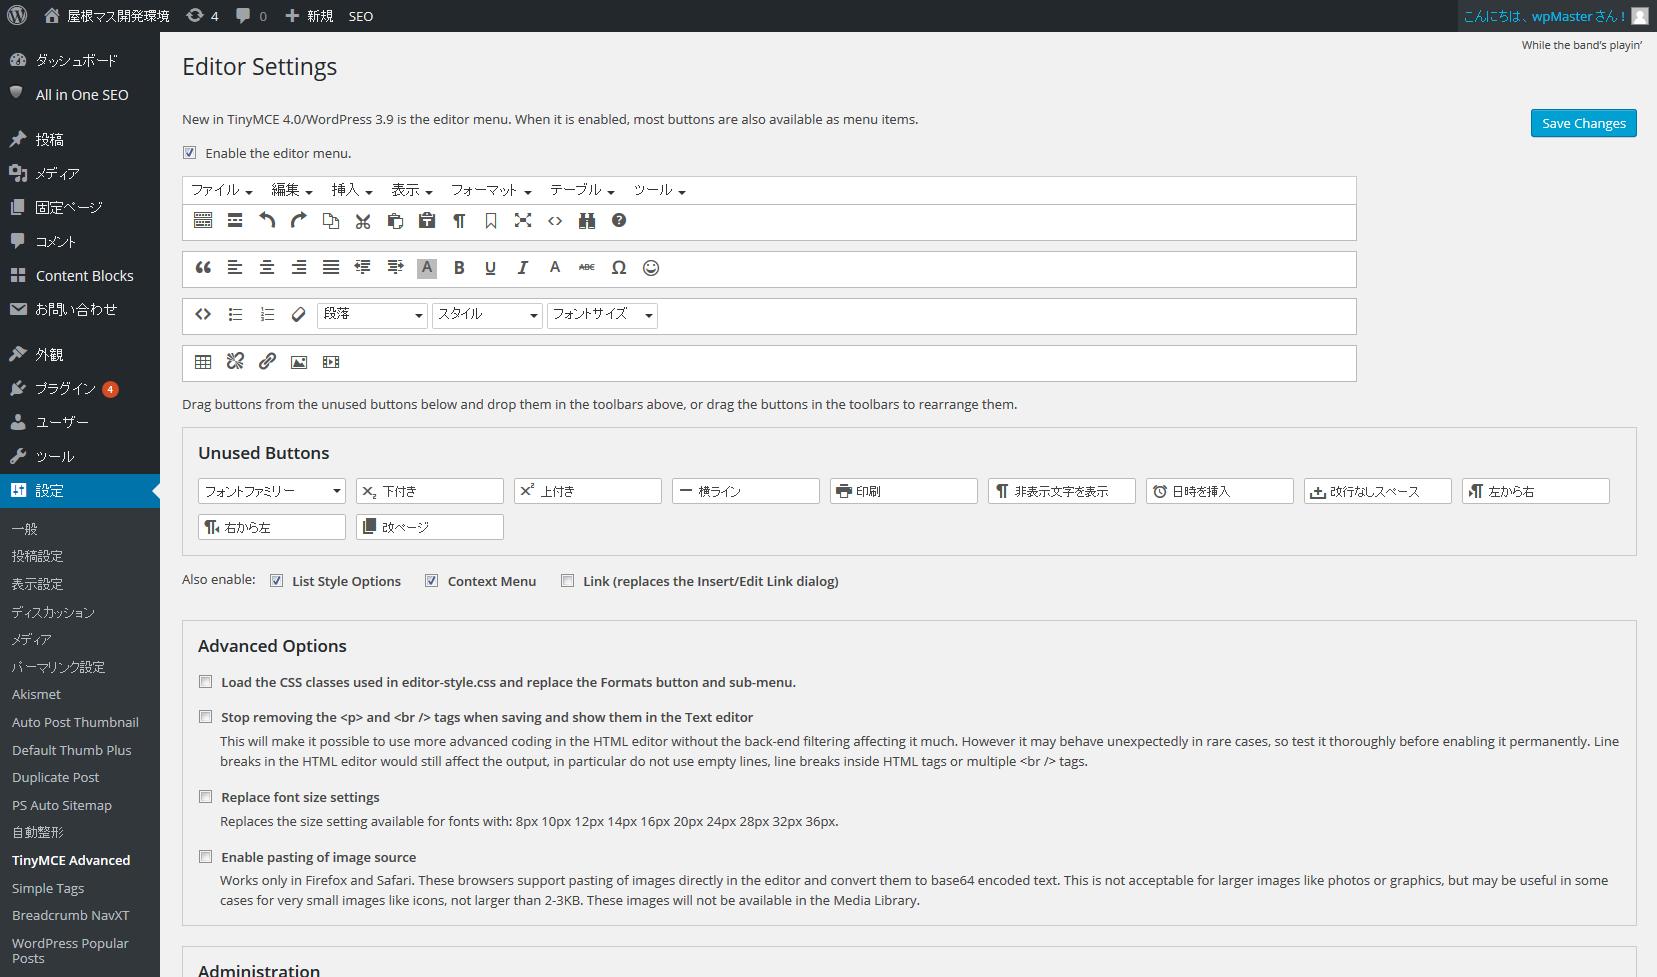 TinyMCE Advanced ‹ 屋根マス開発環境 — WordPress